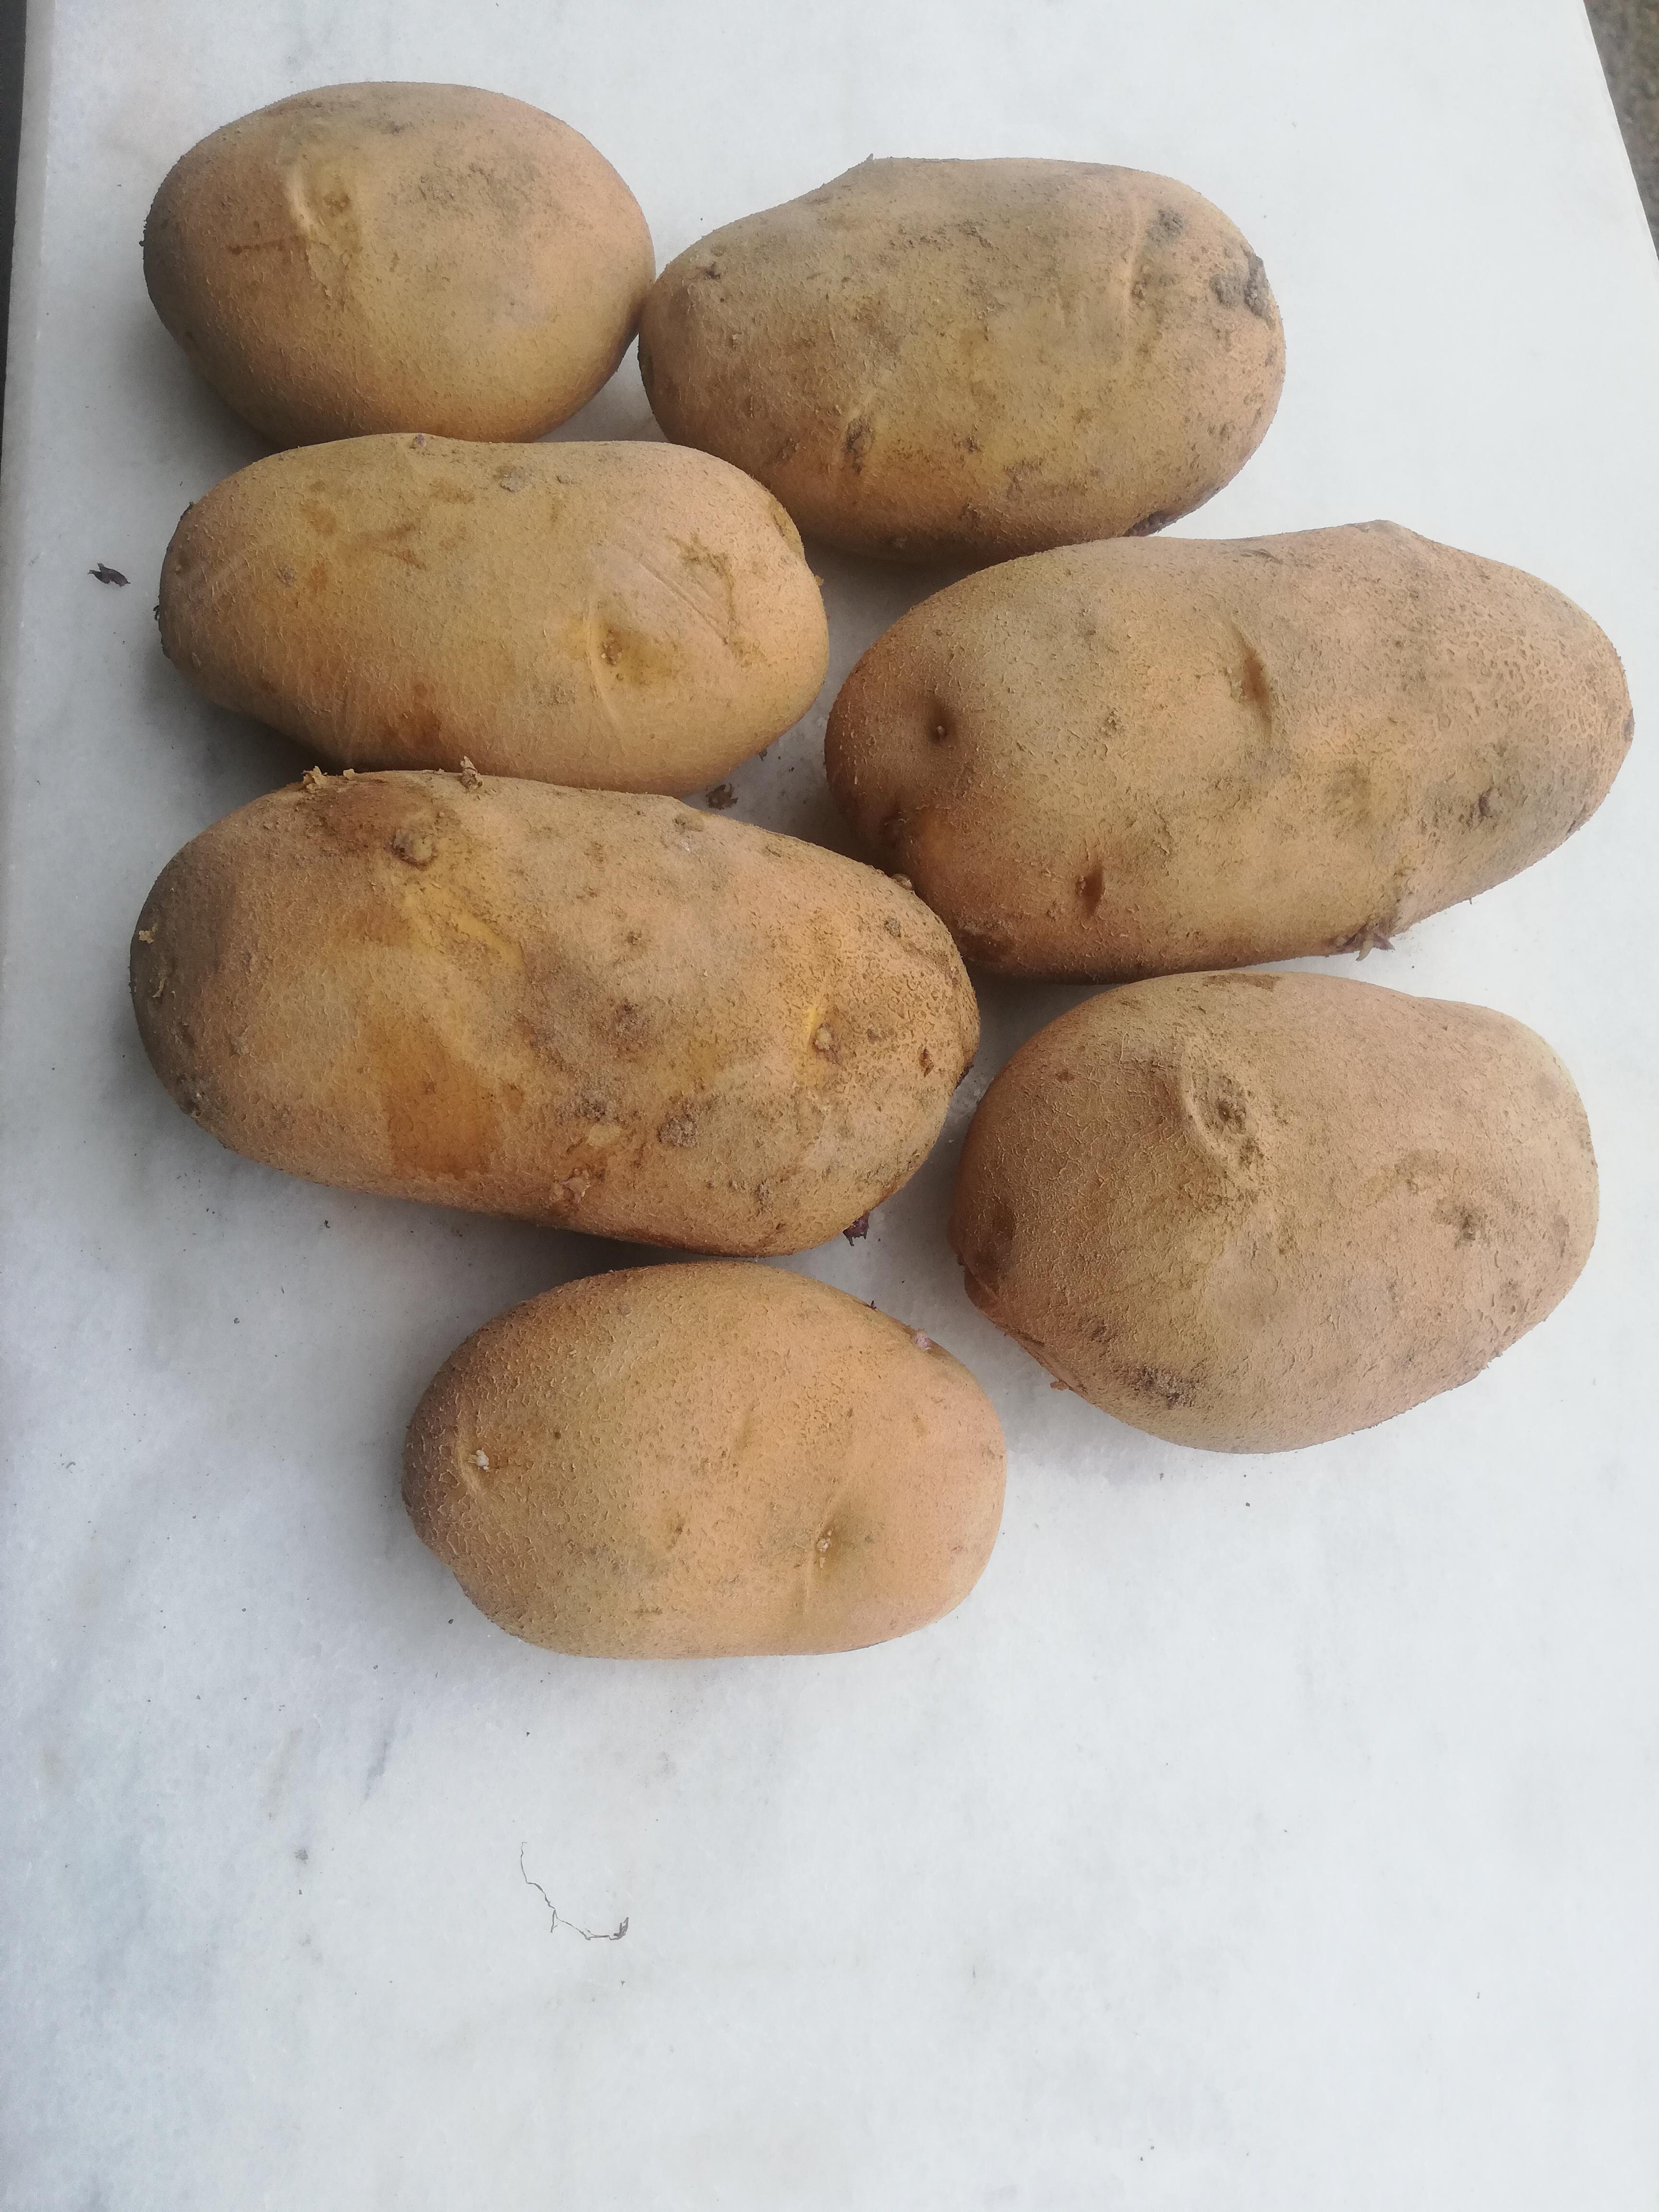 Afyonkarahisar Şuhut Satılık Patates